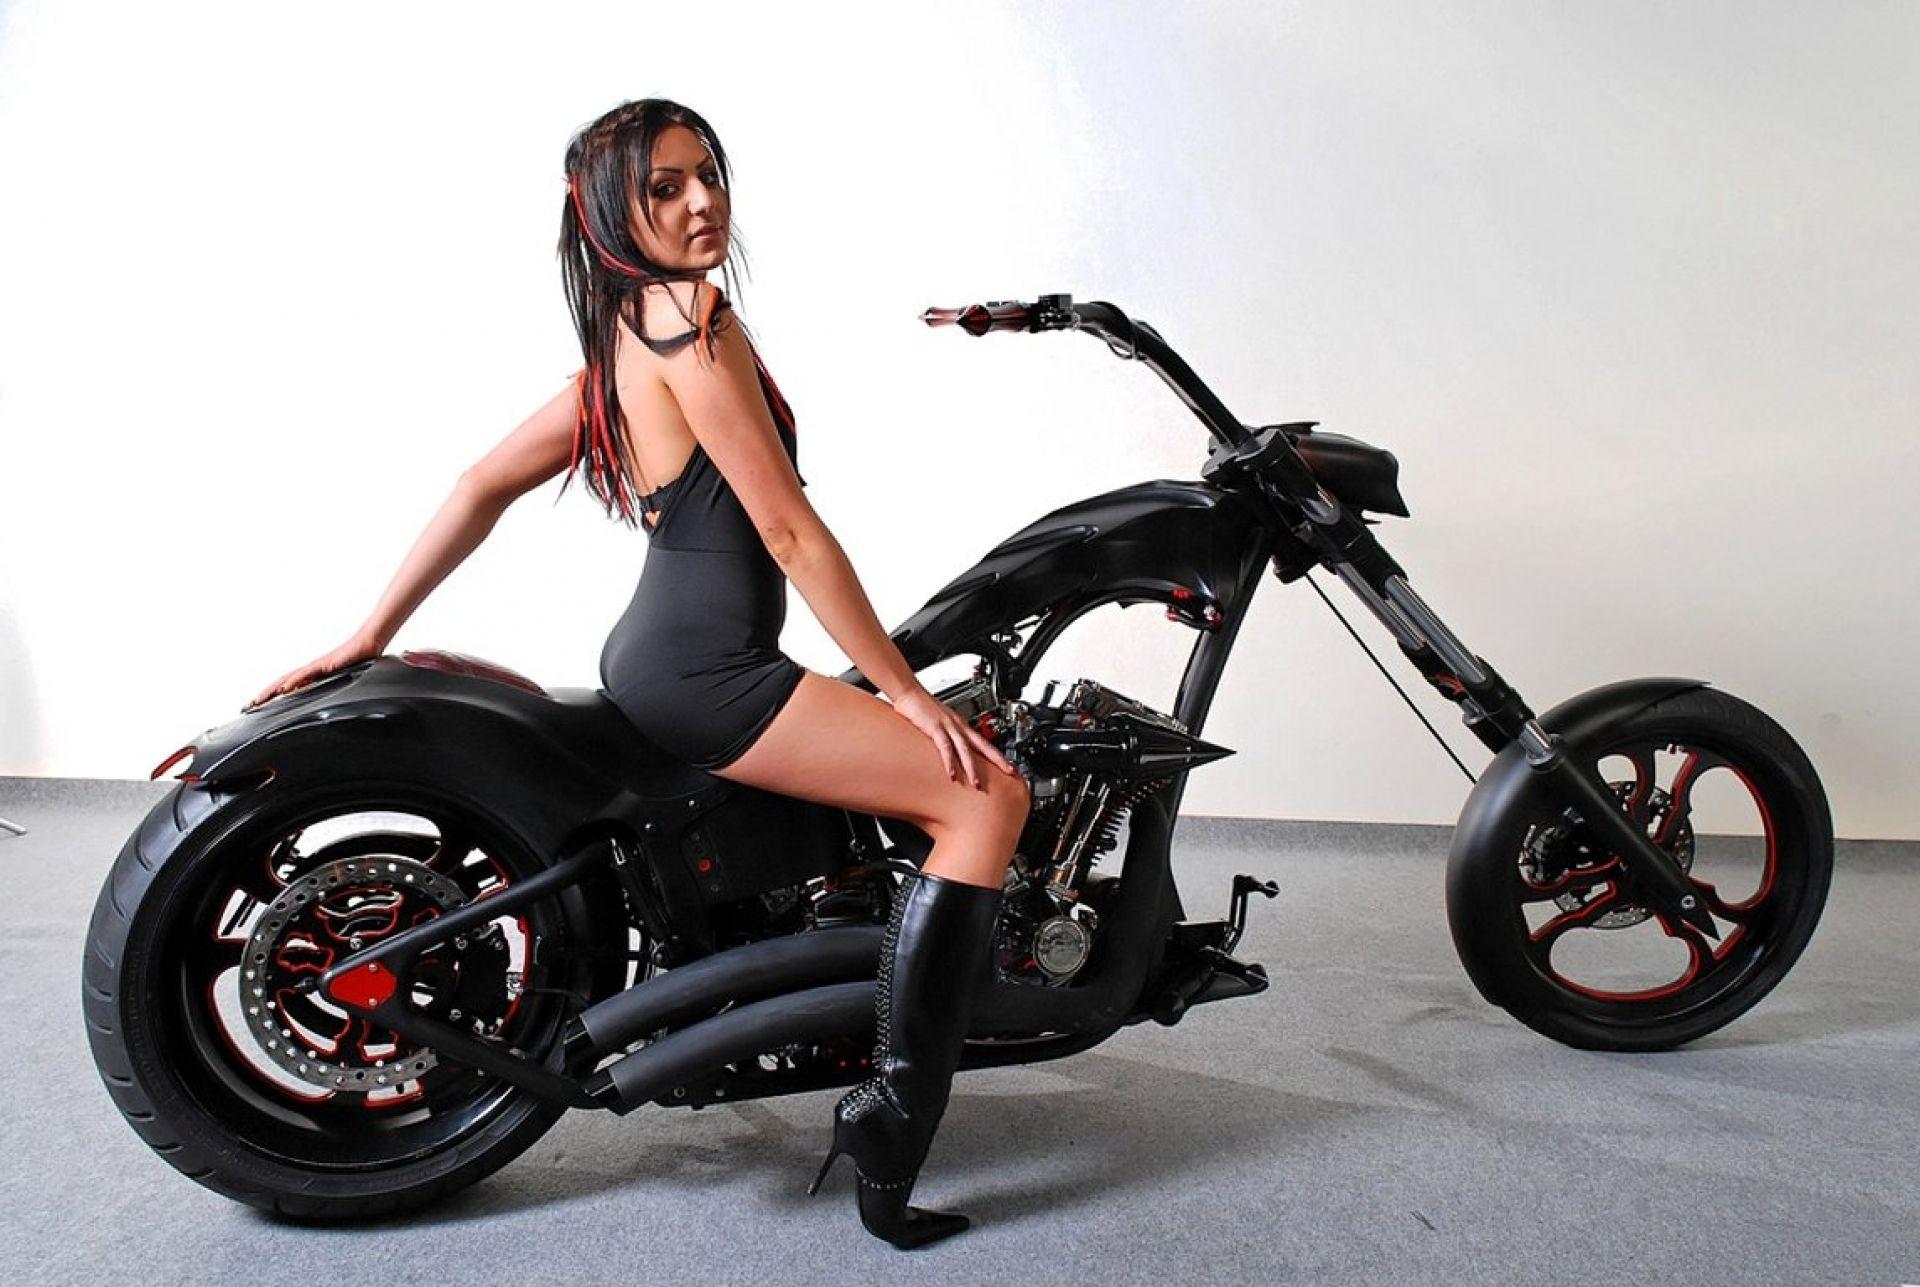 Modelos Harley davidson girl